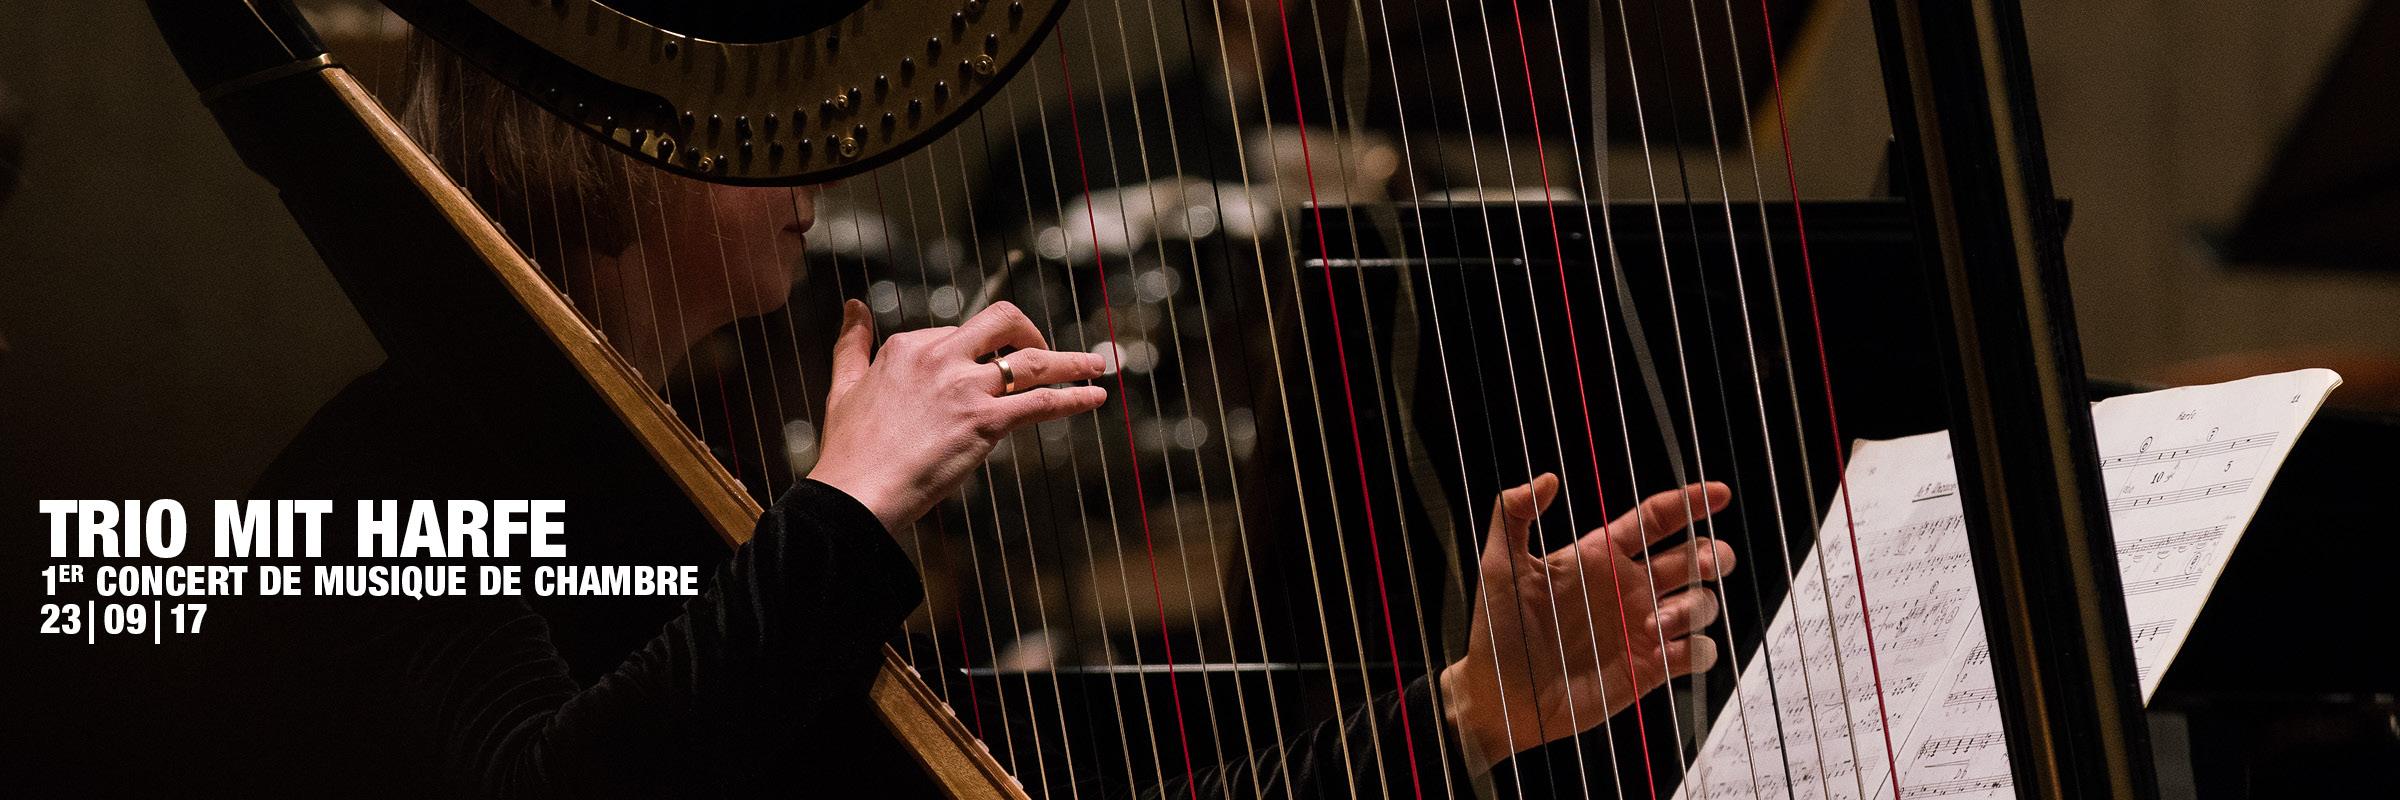 Trio mit Harfe